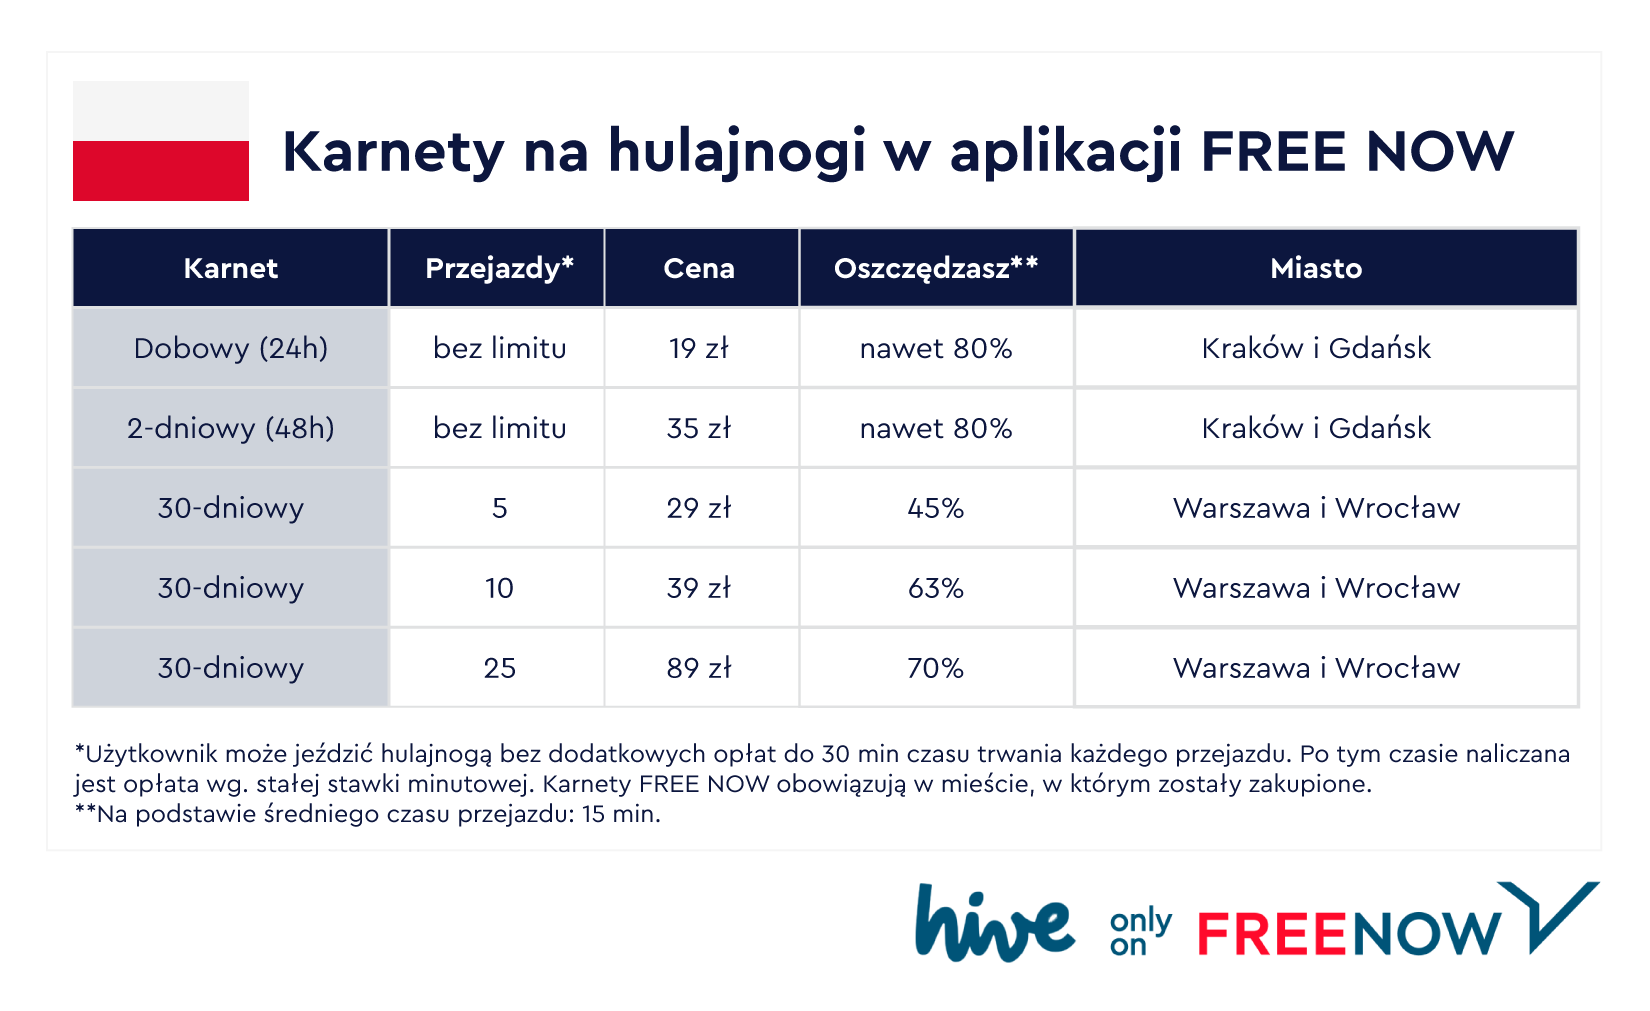 Karnety FREE NOW